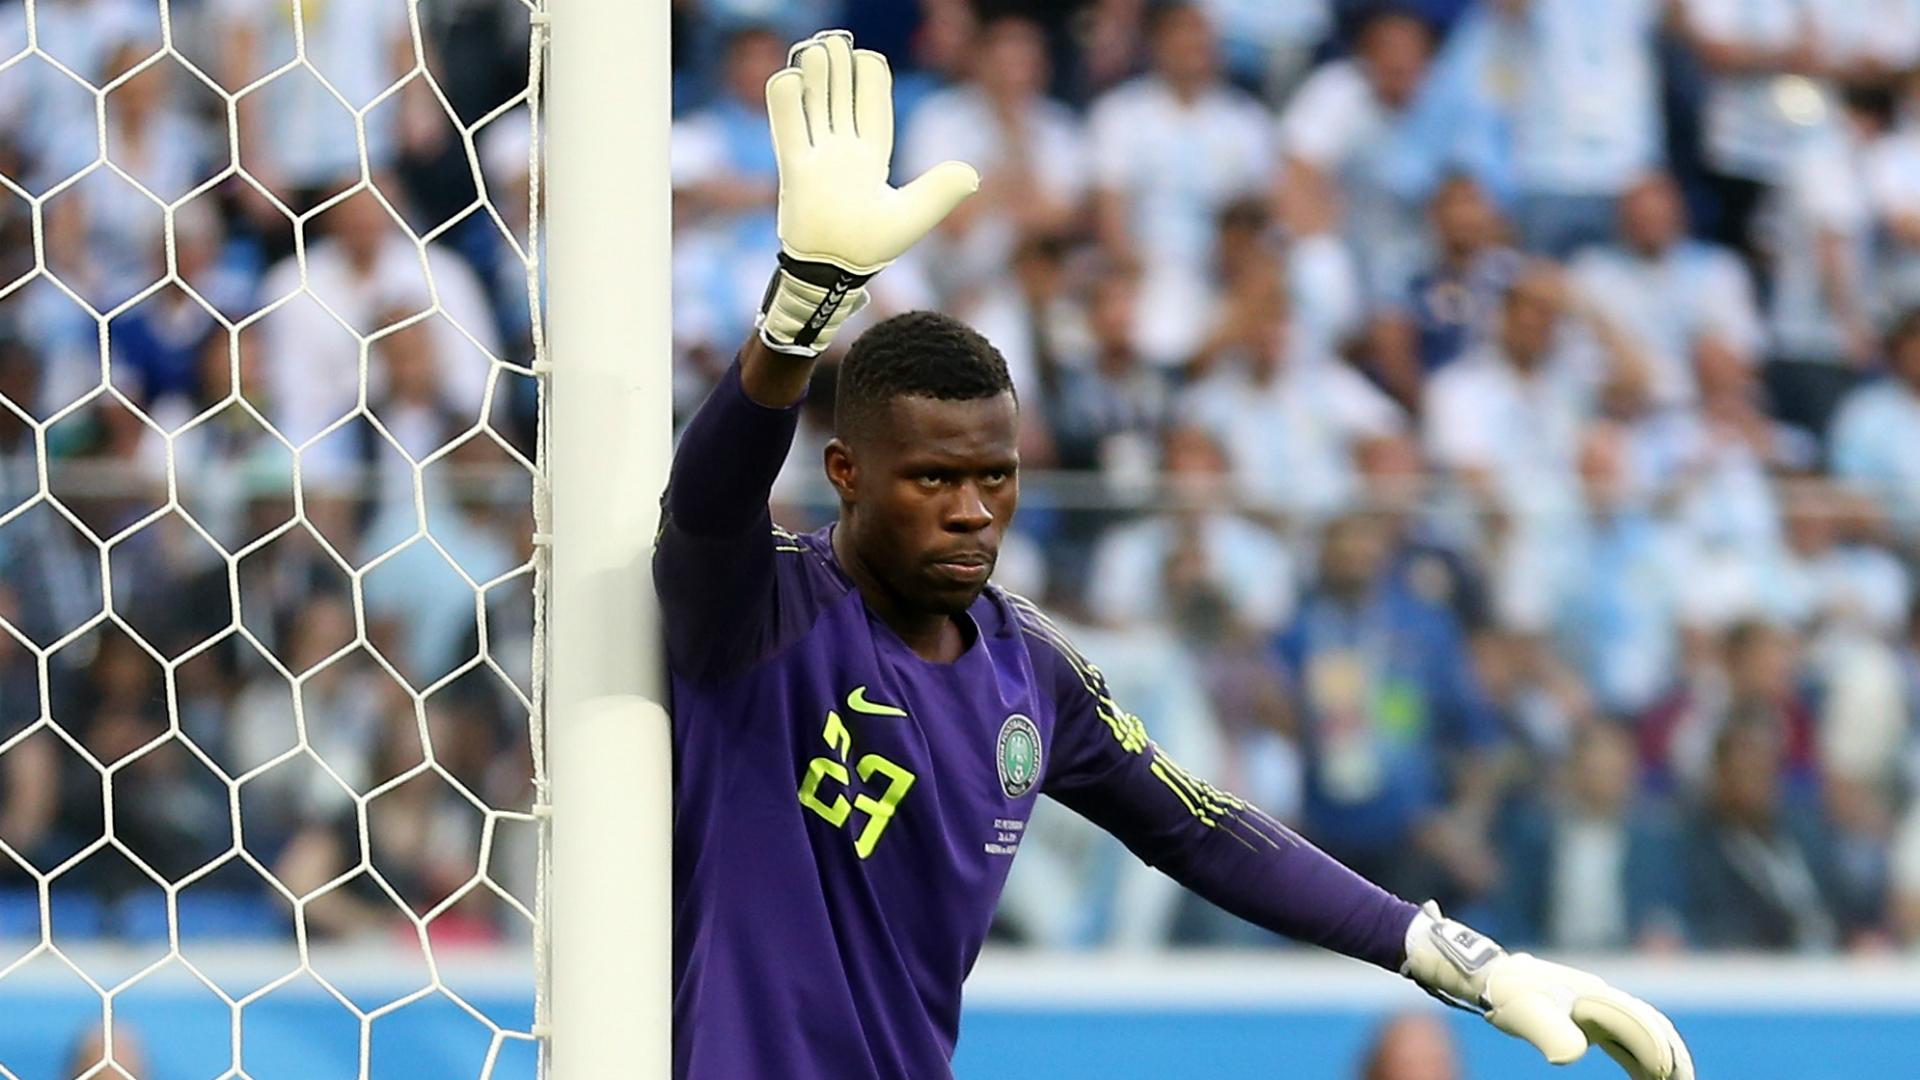 Rohr: Why Nigeria's Uzoho and Olayinka missed Cameroon friendly